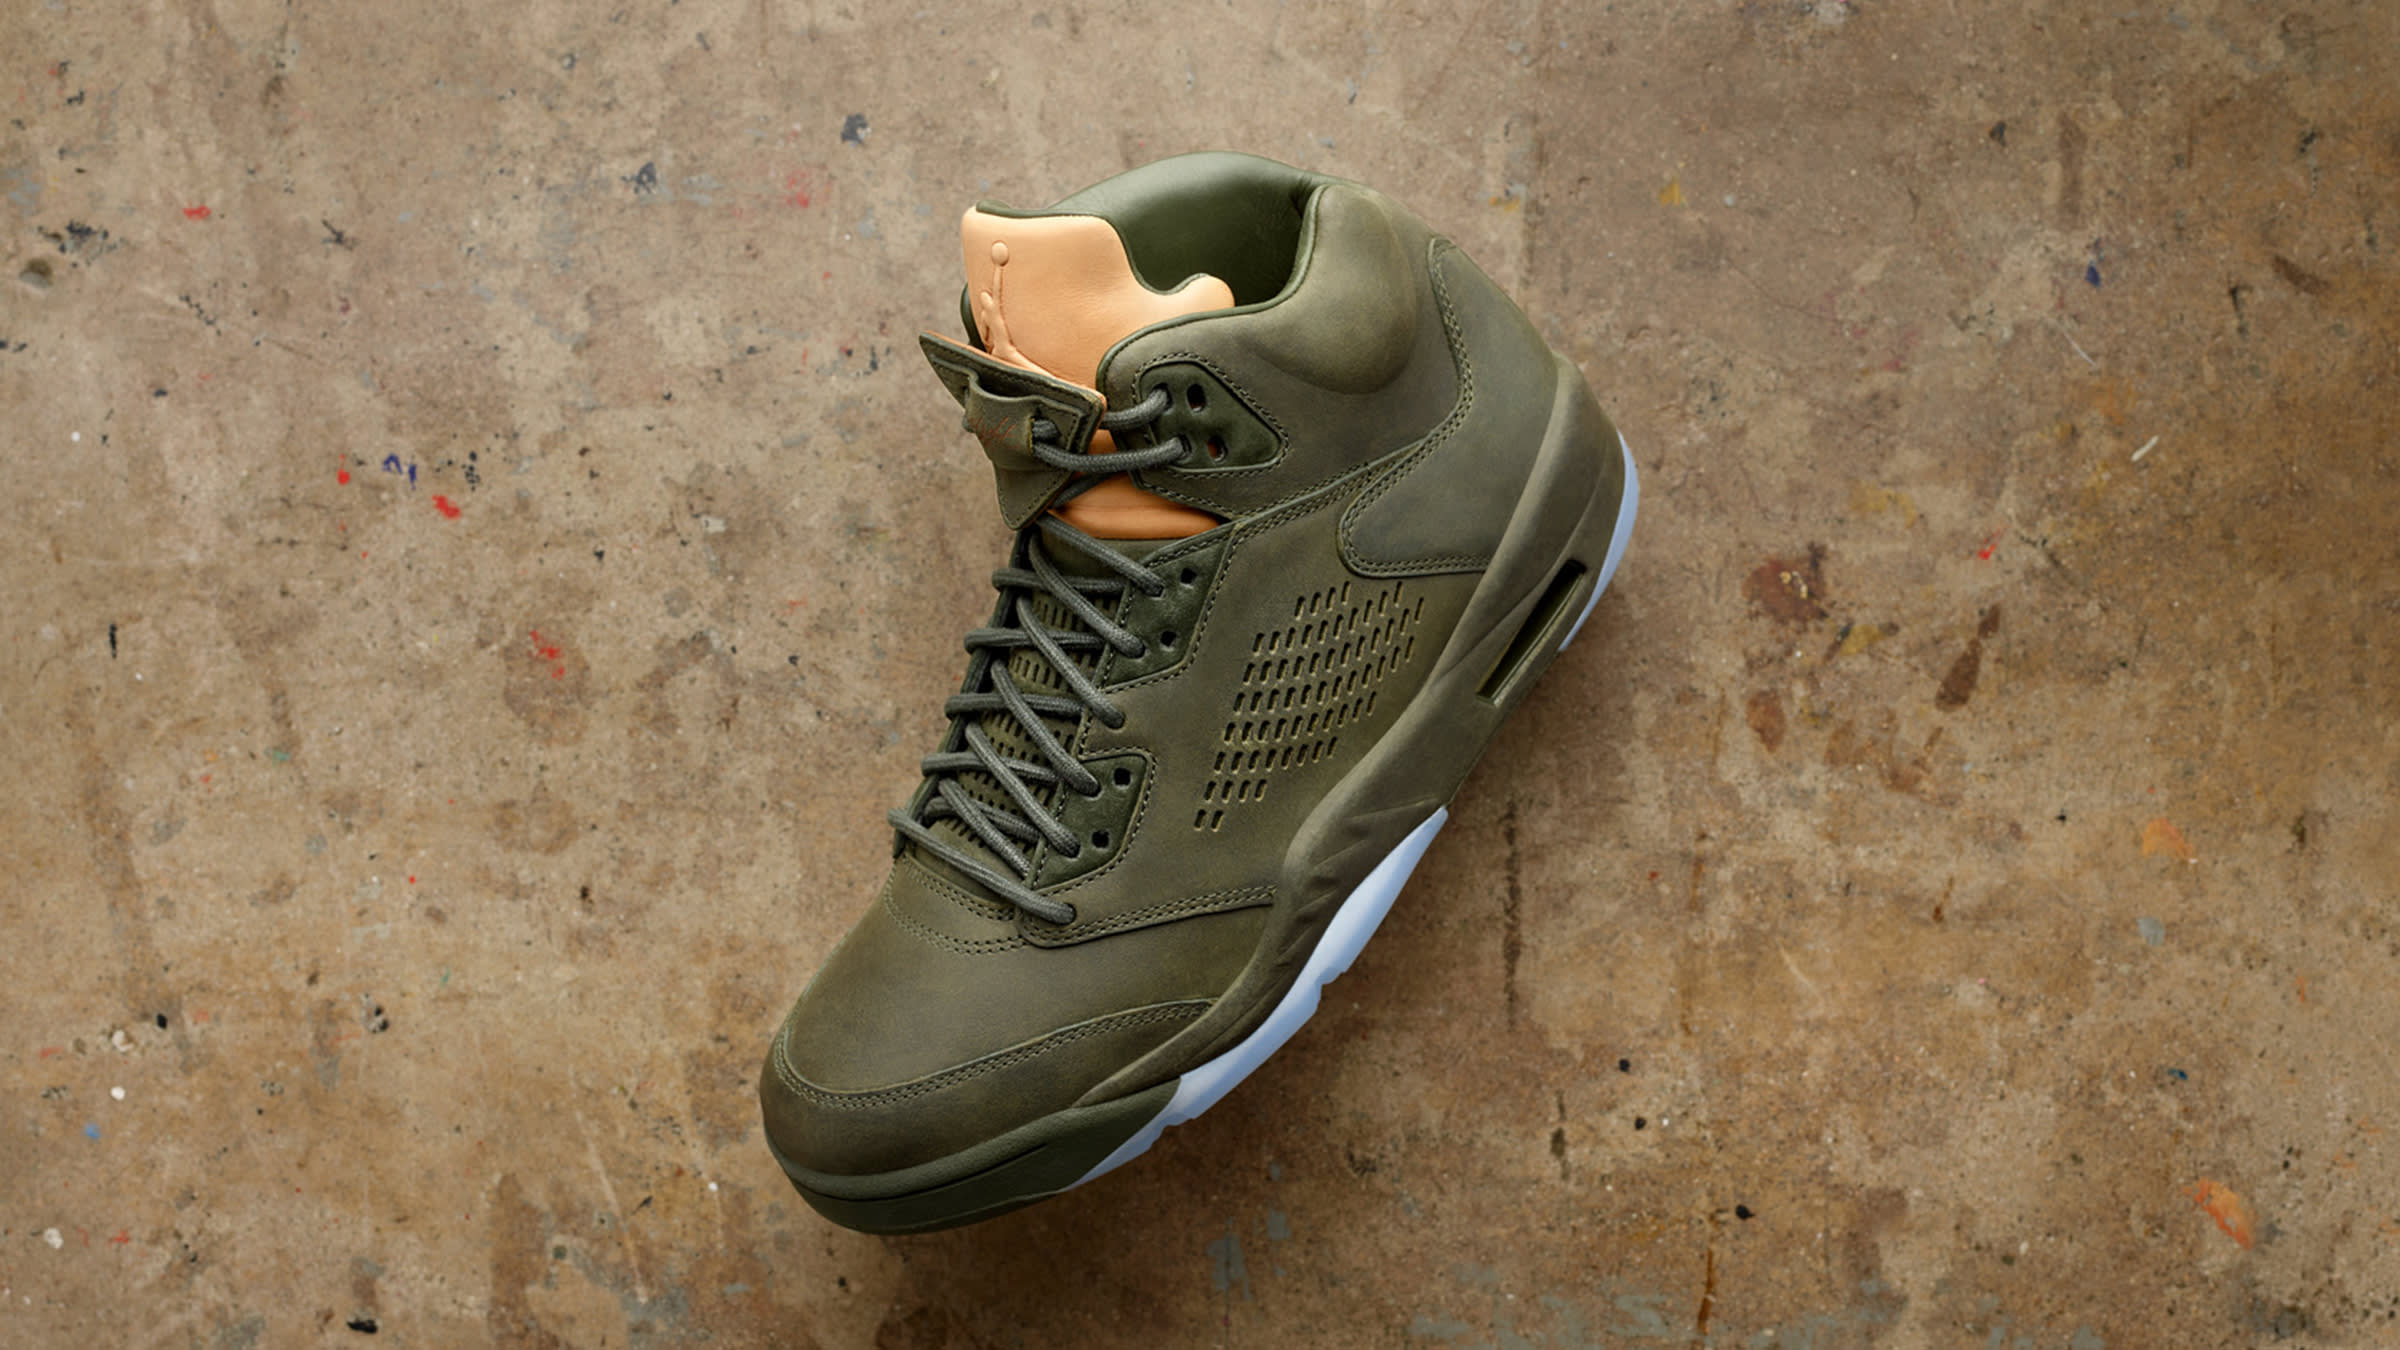 reputable site 5b81c b723f Nike Air Jordan 5 Premium  Take Flight  Sequoia   Metallic Gold   END.